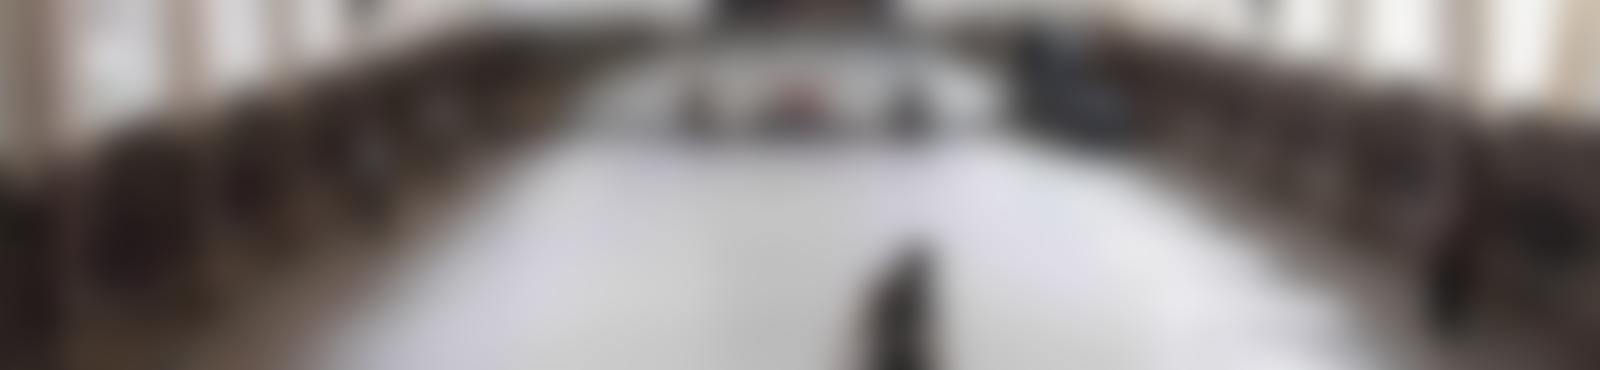 Blurred b5403f98 940e 429c 8b8e 392eabf48d9e